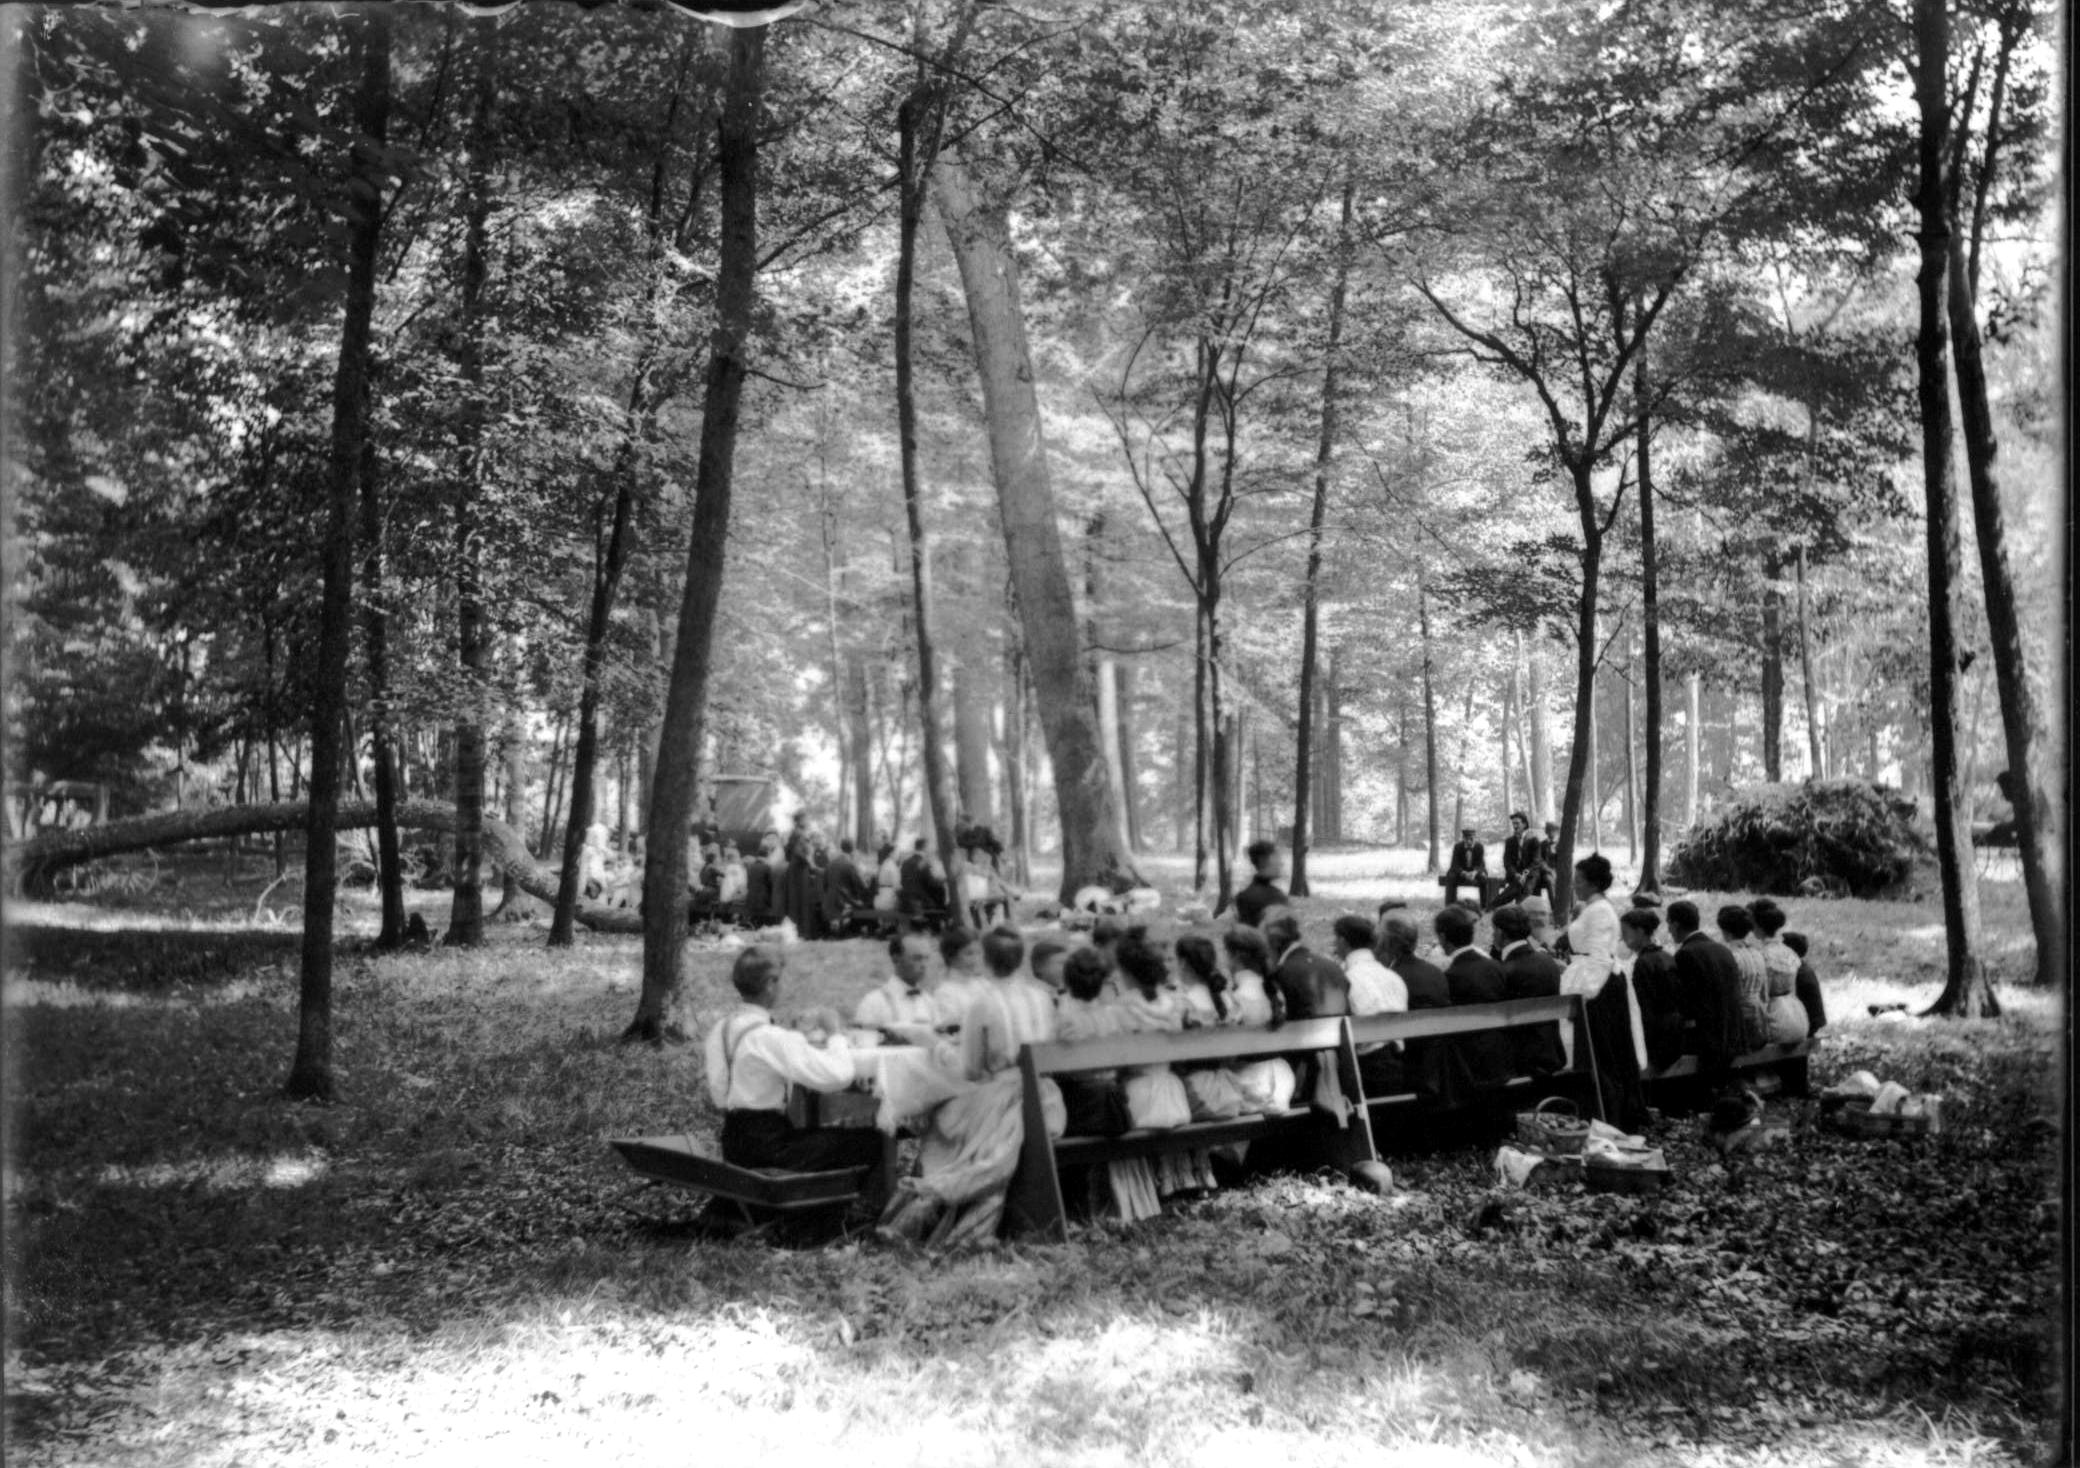 Reunion 1901